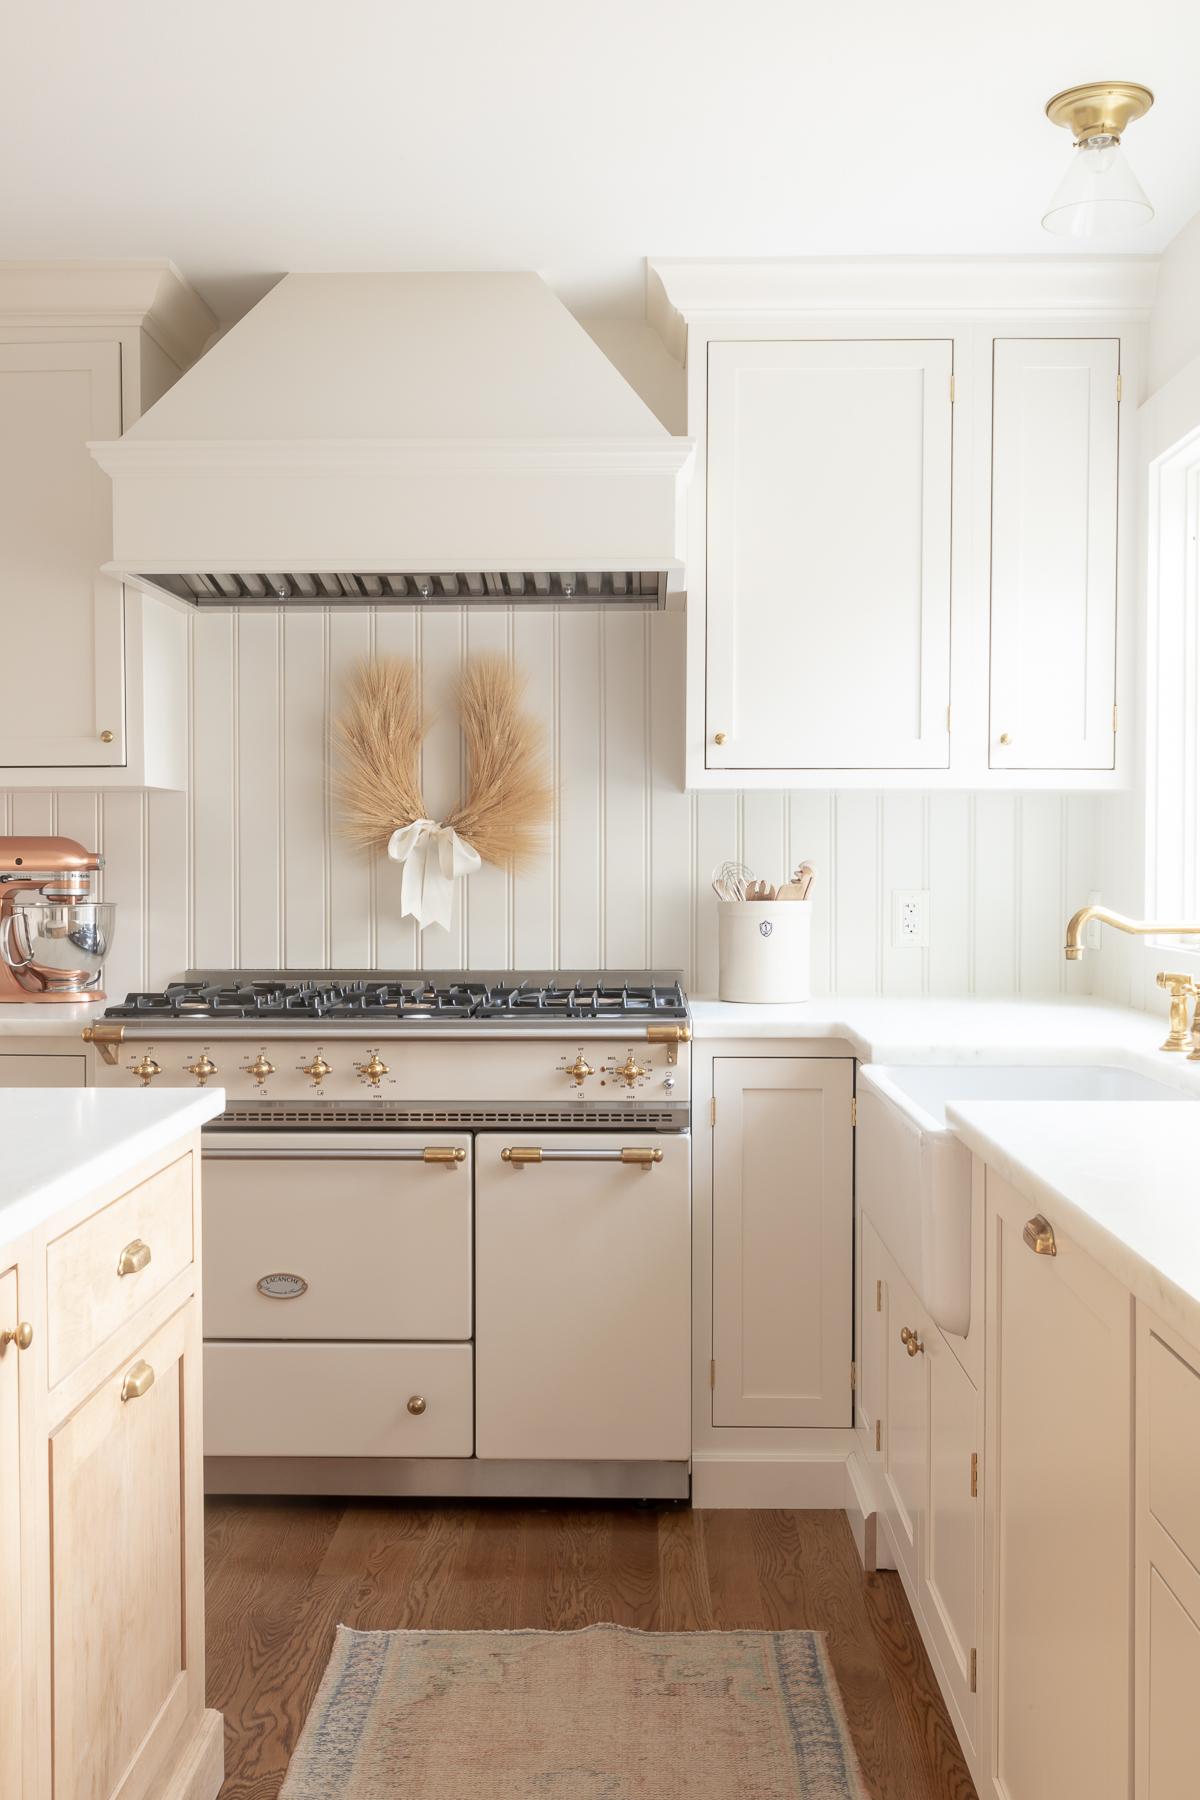 kitchen with wheat wreath